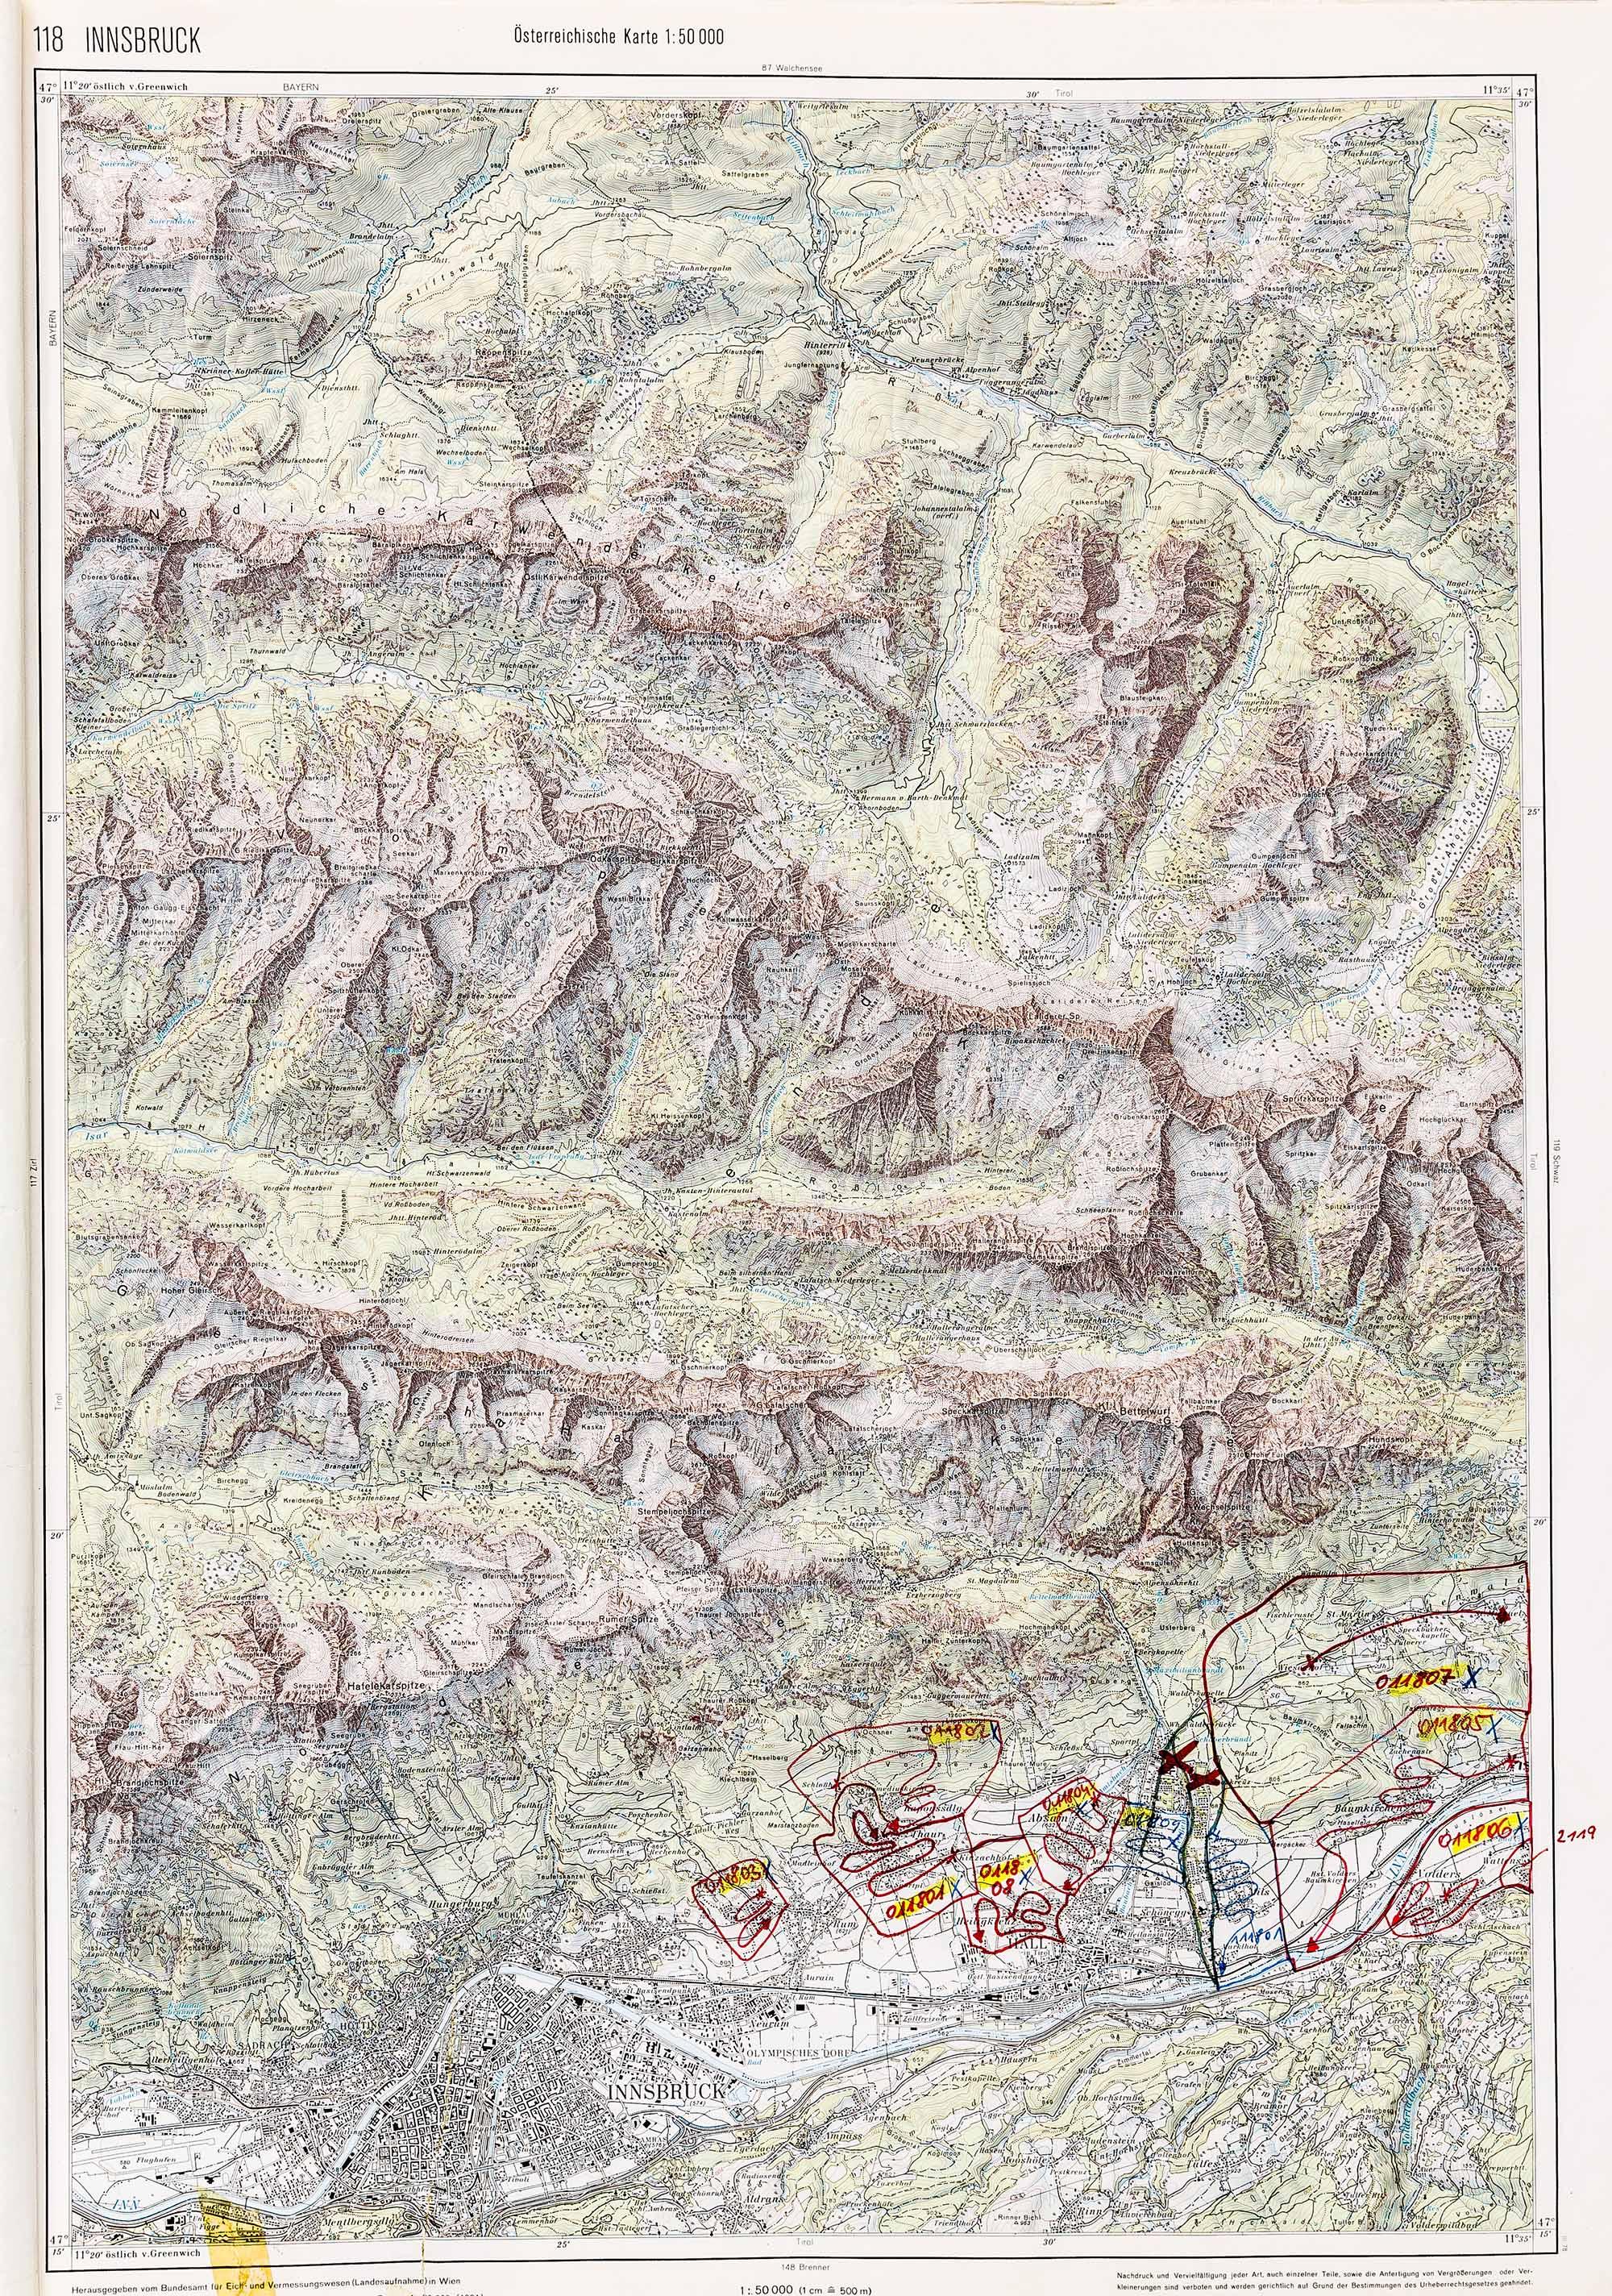 1979-1982 Karte 118